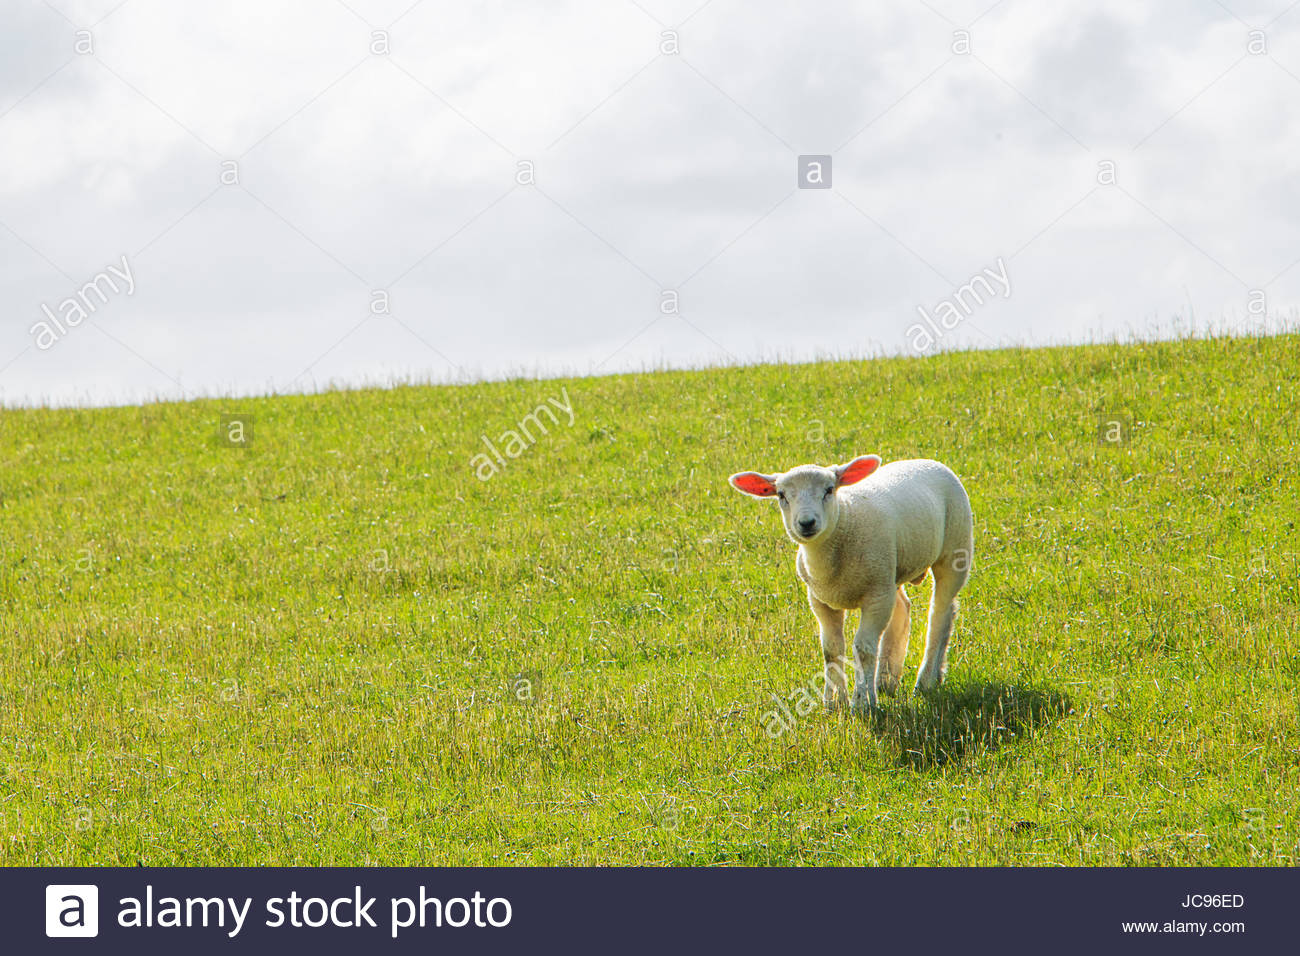 Baby sheep lamb puppy sheep wooly sheep fluffy cute northern germany dithmarschen common land sheep texel sheep Stock Photo